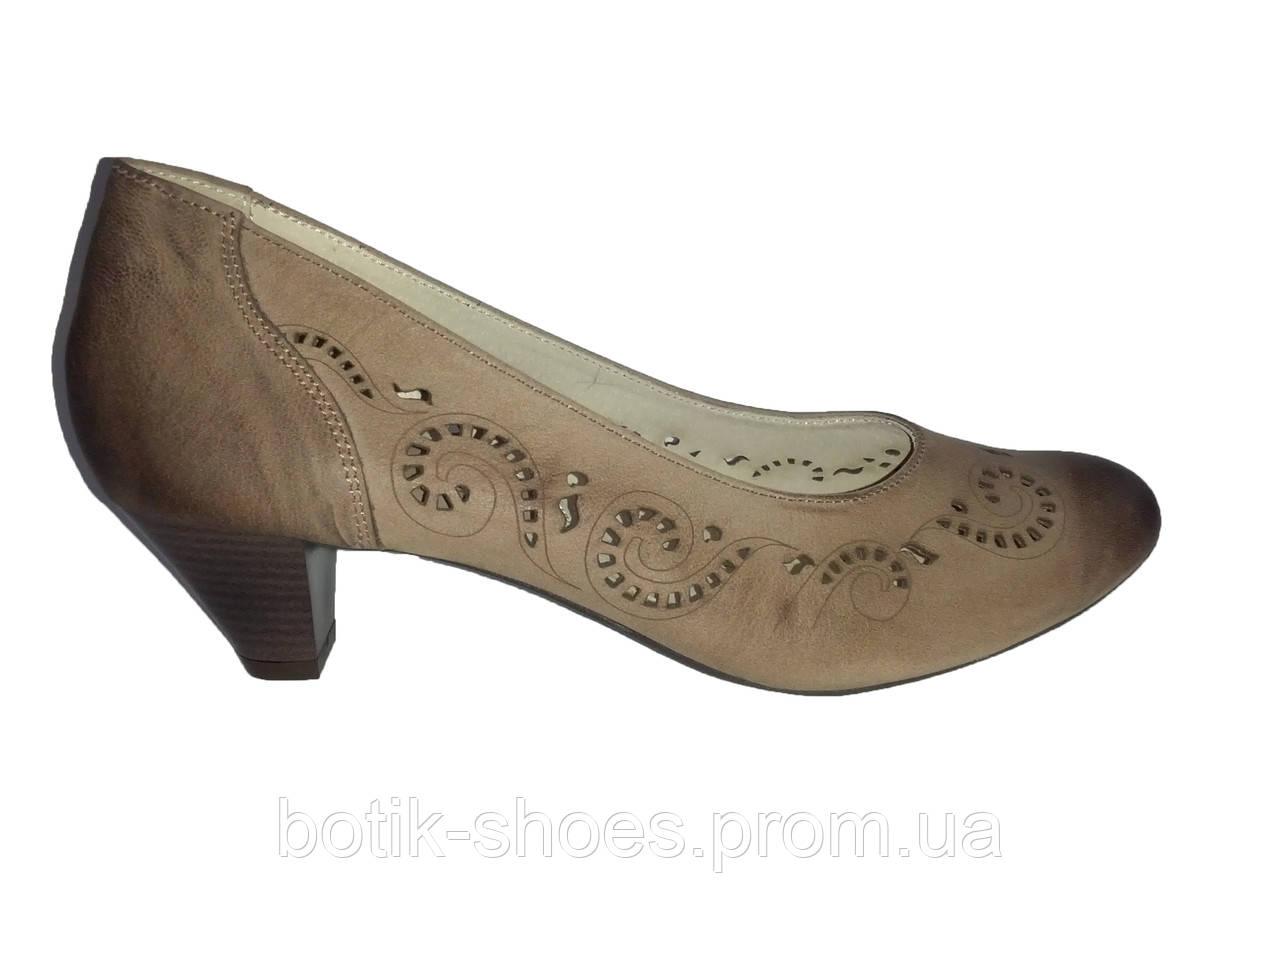 61d631043e85 Туфли женские кожаные на каблуке коричневые Kazkobut 2488 - Bigl.ua